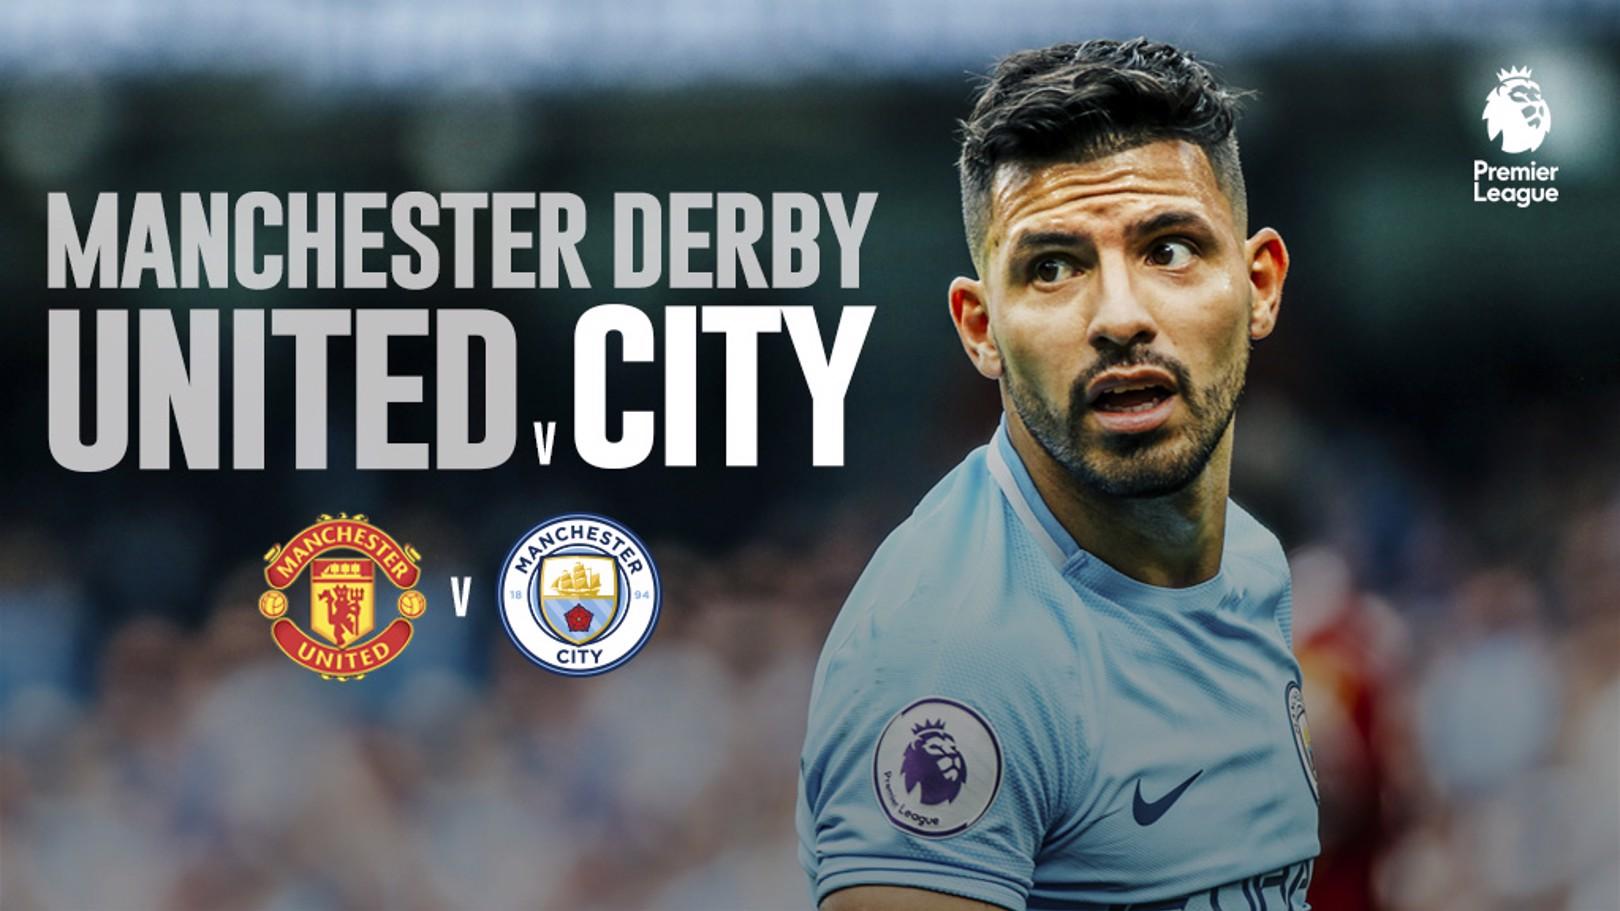 United x City Kun